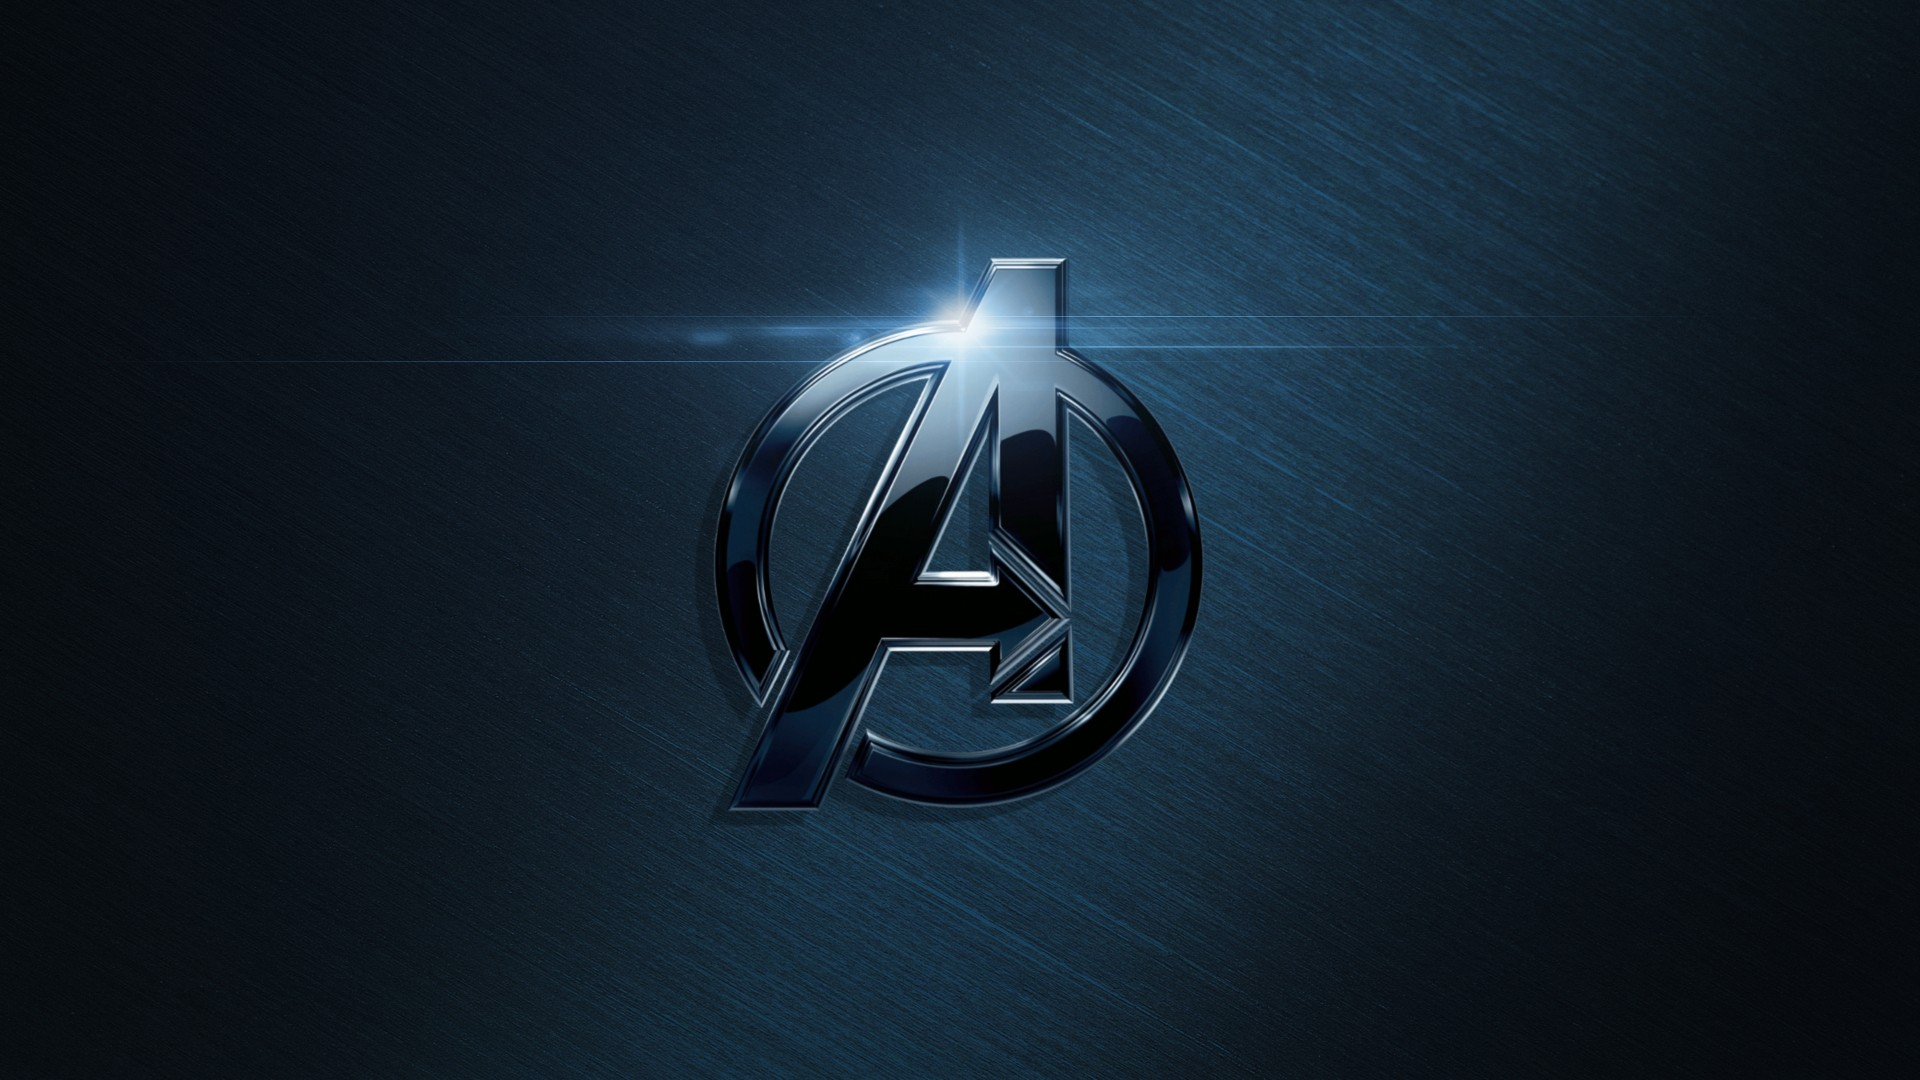 Image movie the avengers logo hd free comic - Avengers a logo 4k ...